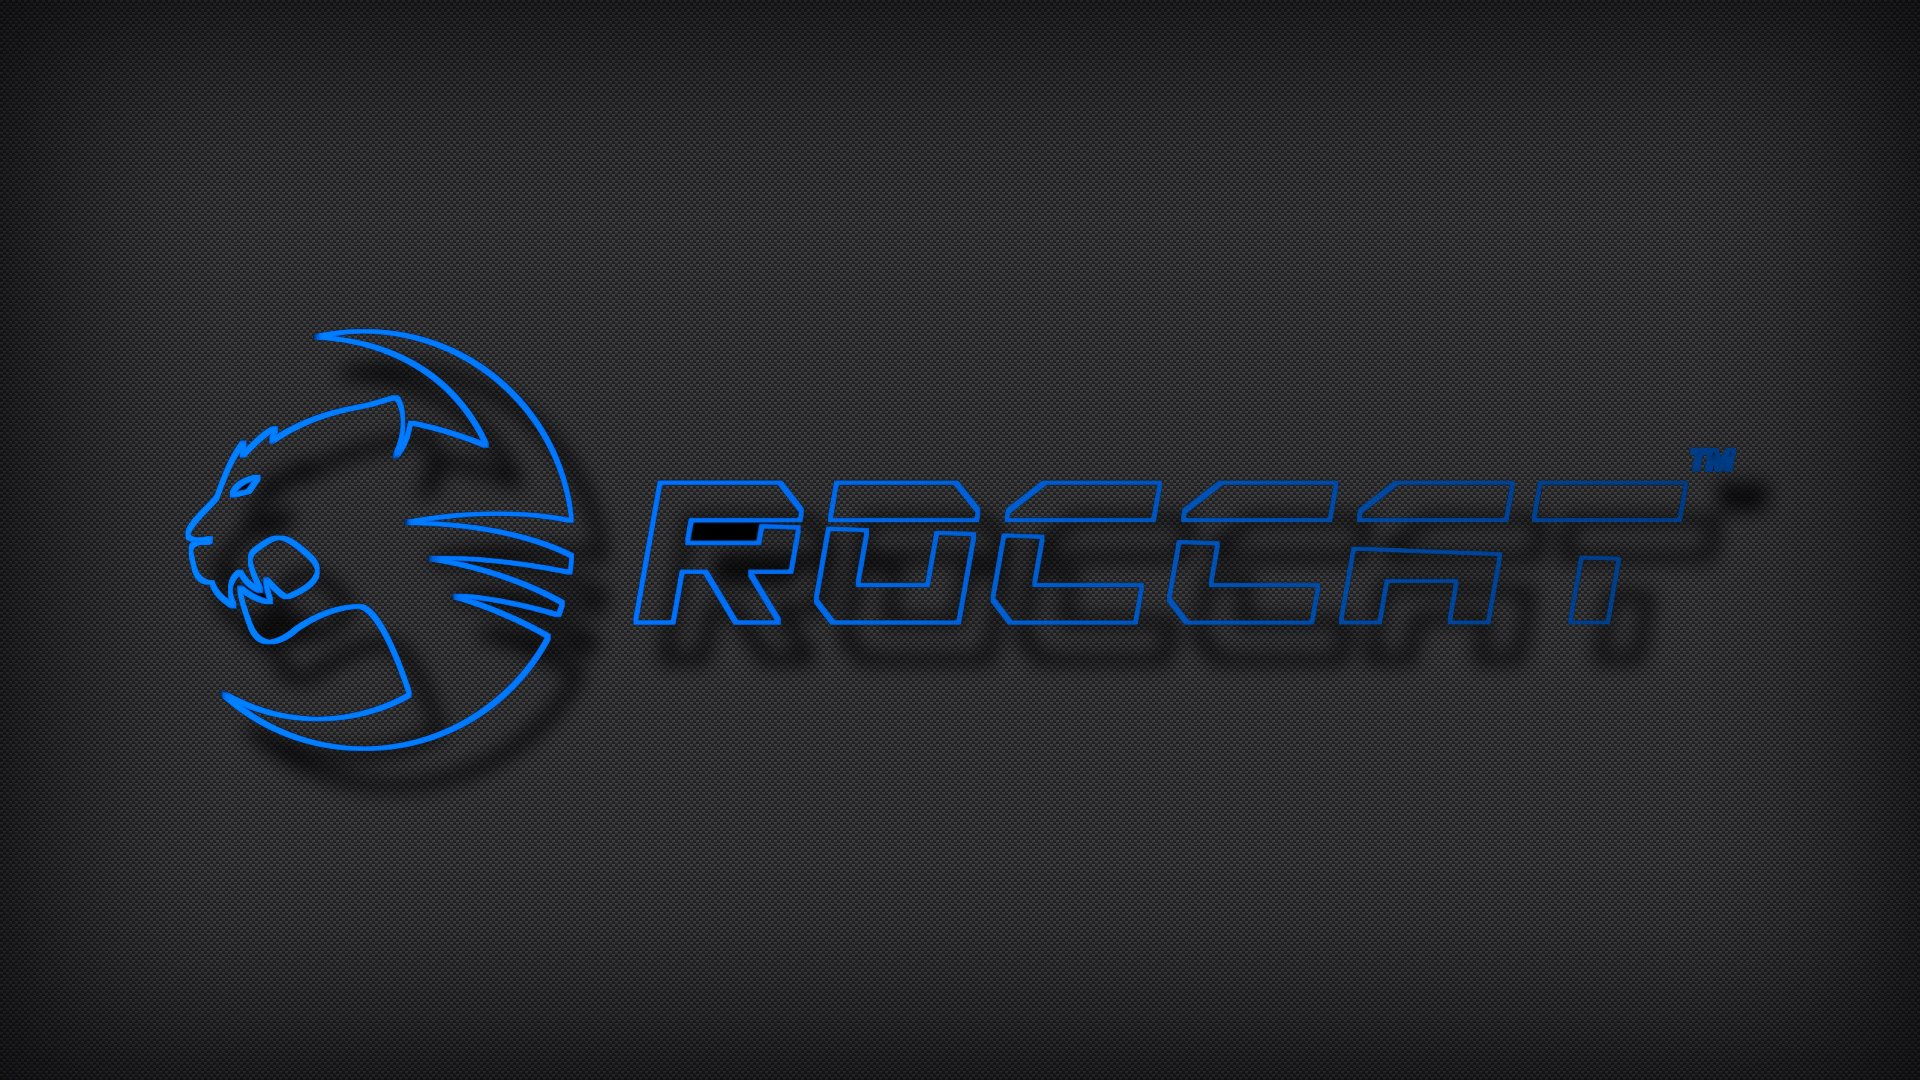 download roccat logo wallpaper - photo #17